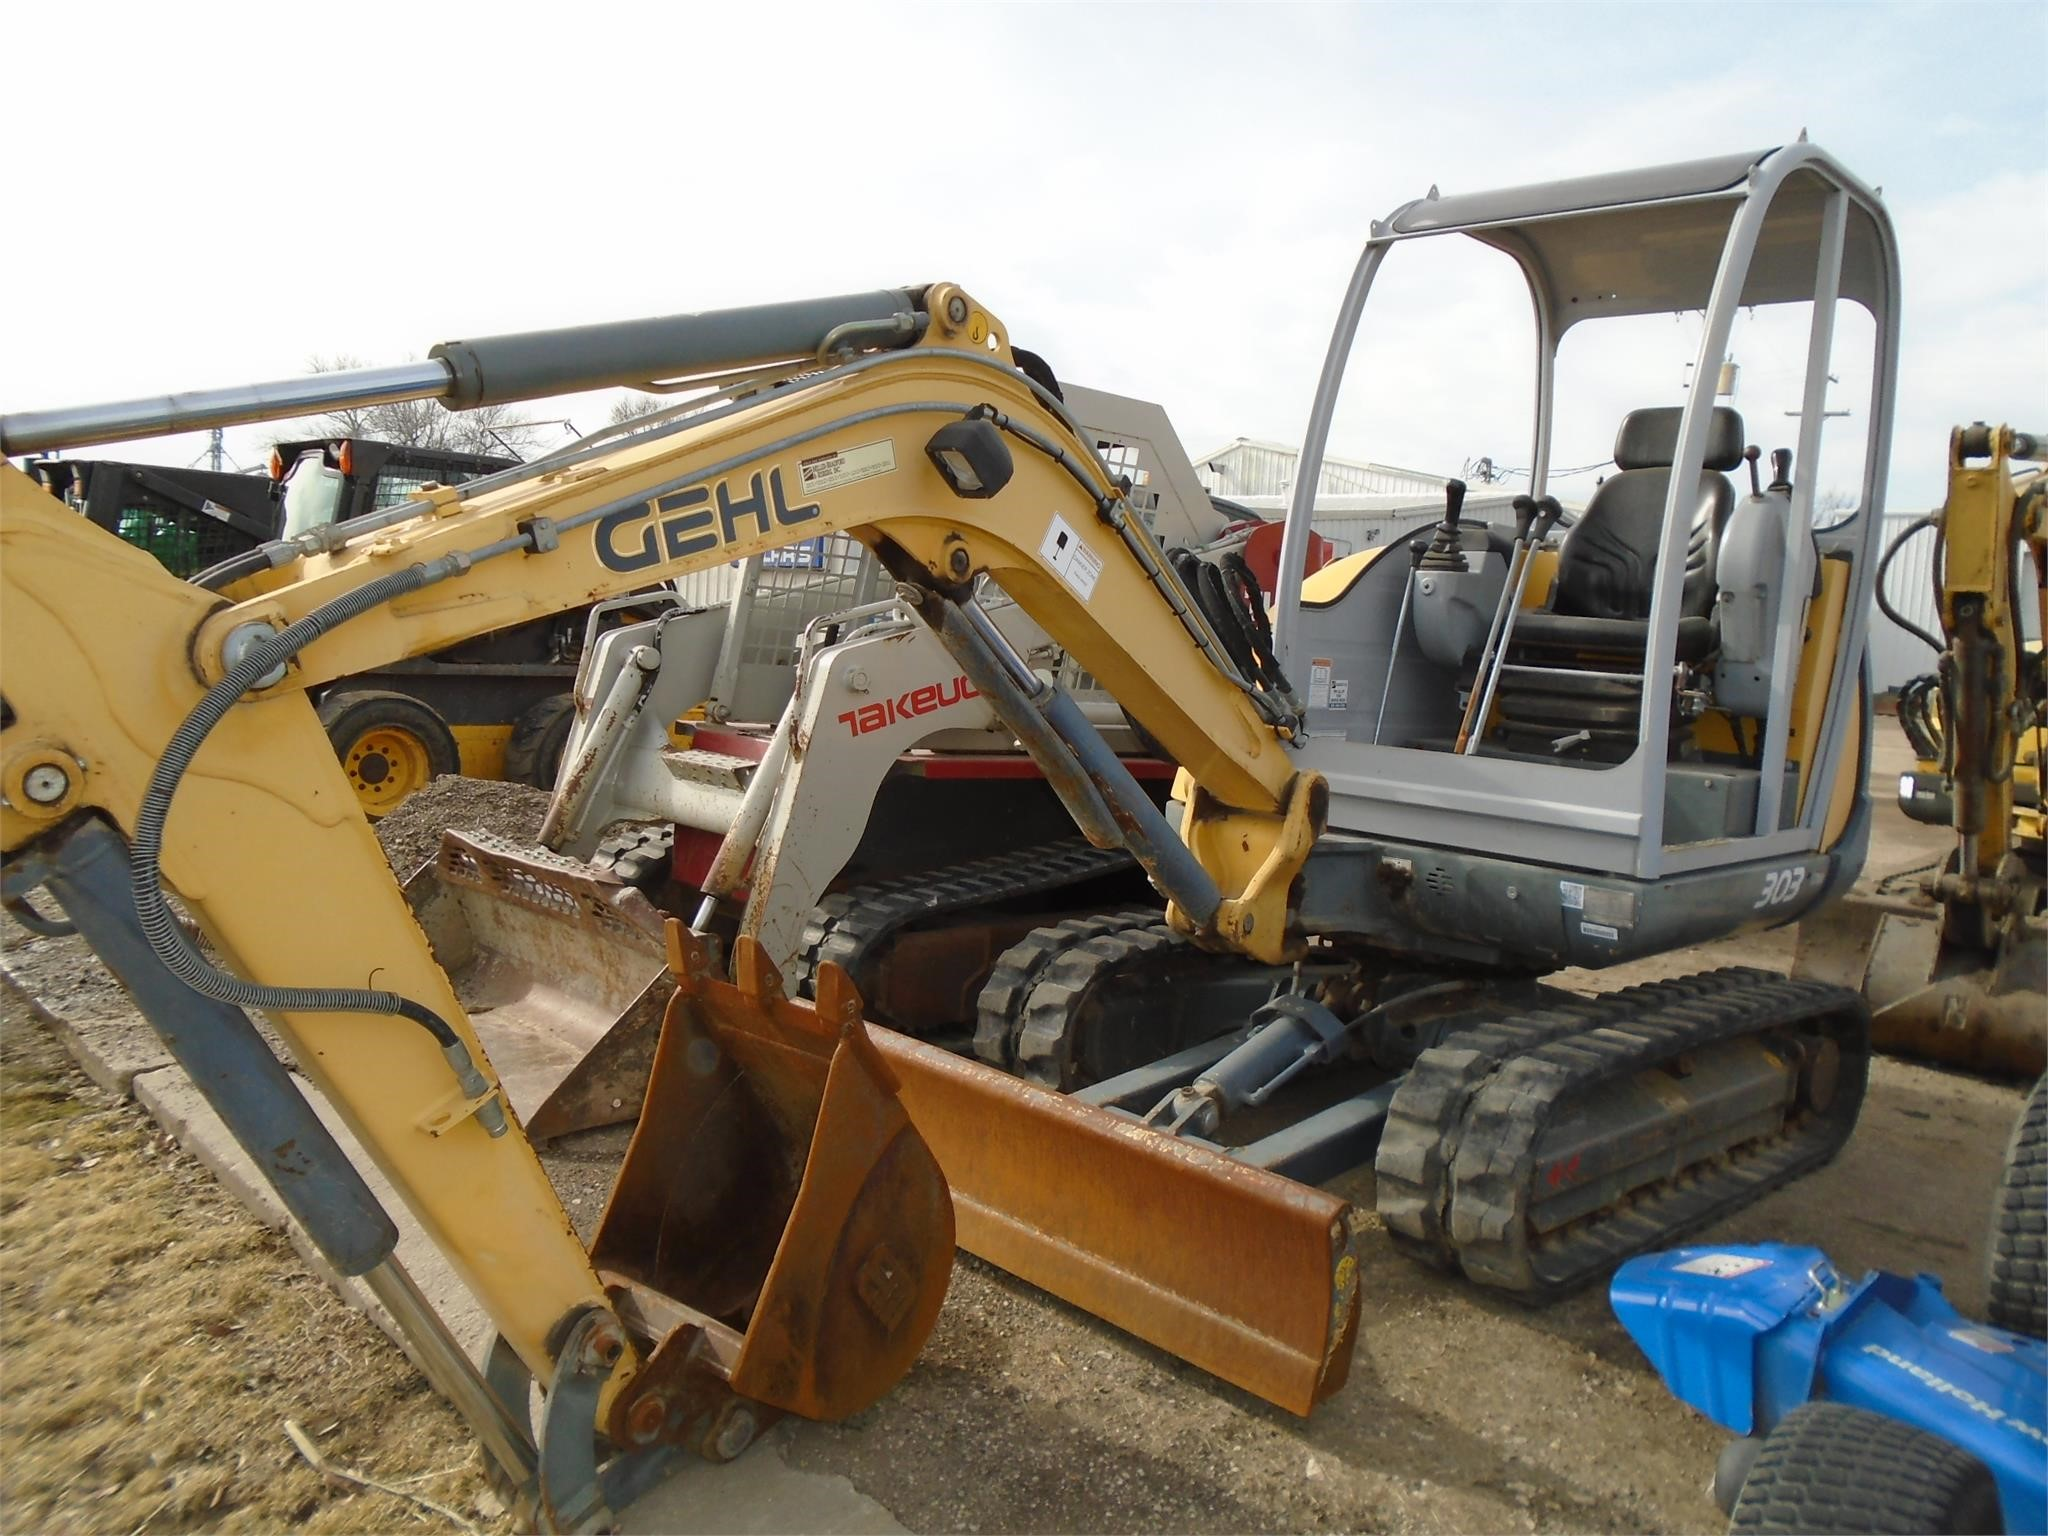 2006 Gehl GE303 Excavators and Mini Excavator